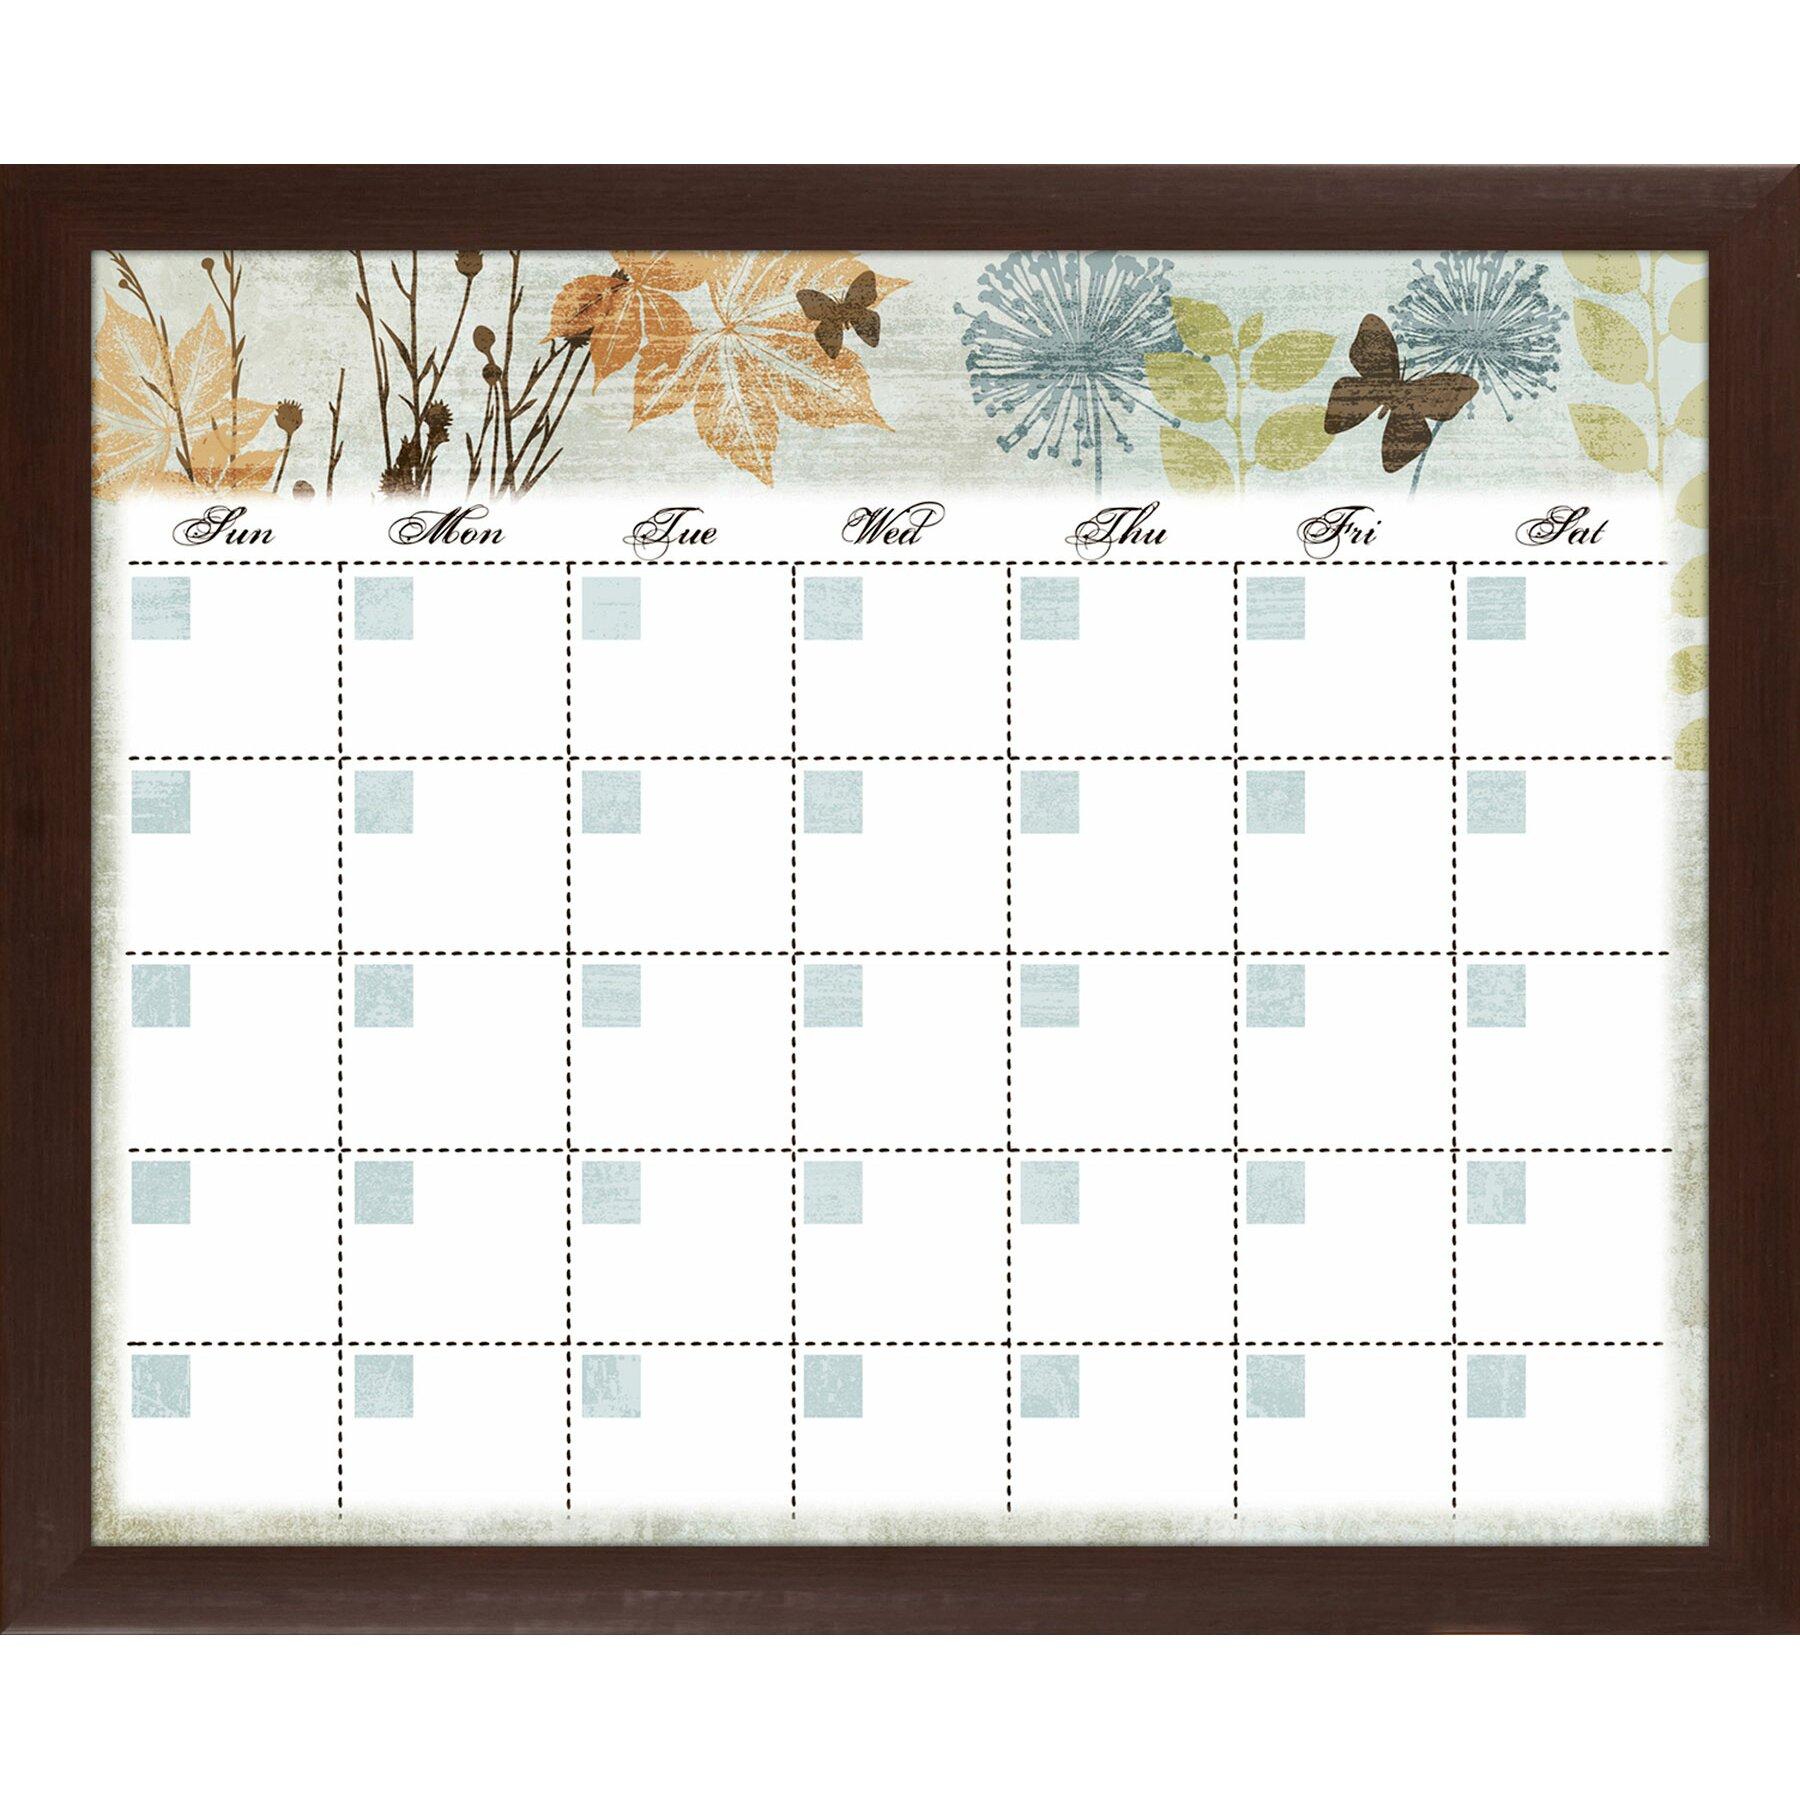 Calendar Planner Board : Ptm images banbury memo calendar planner glass dry erase